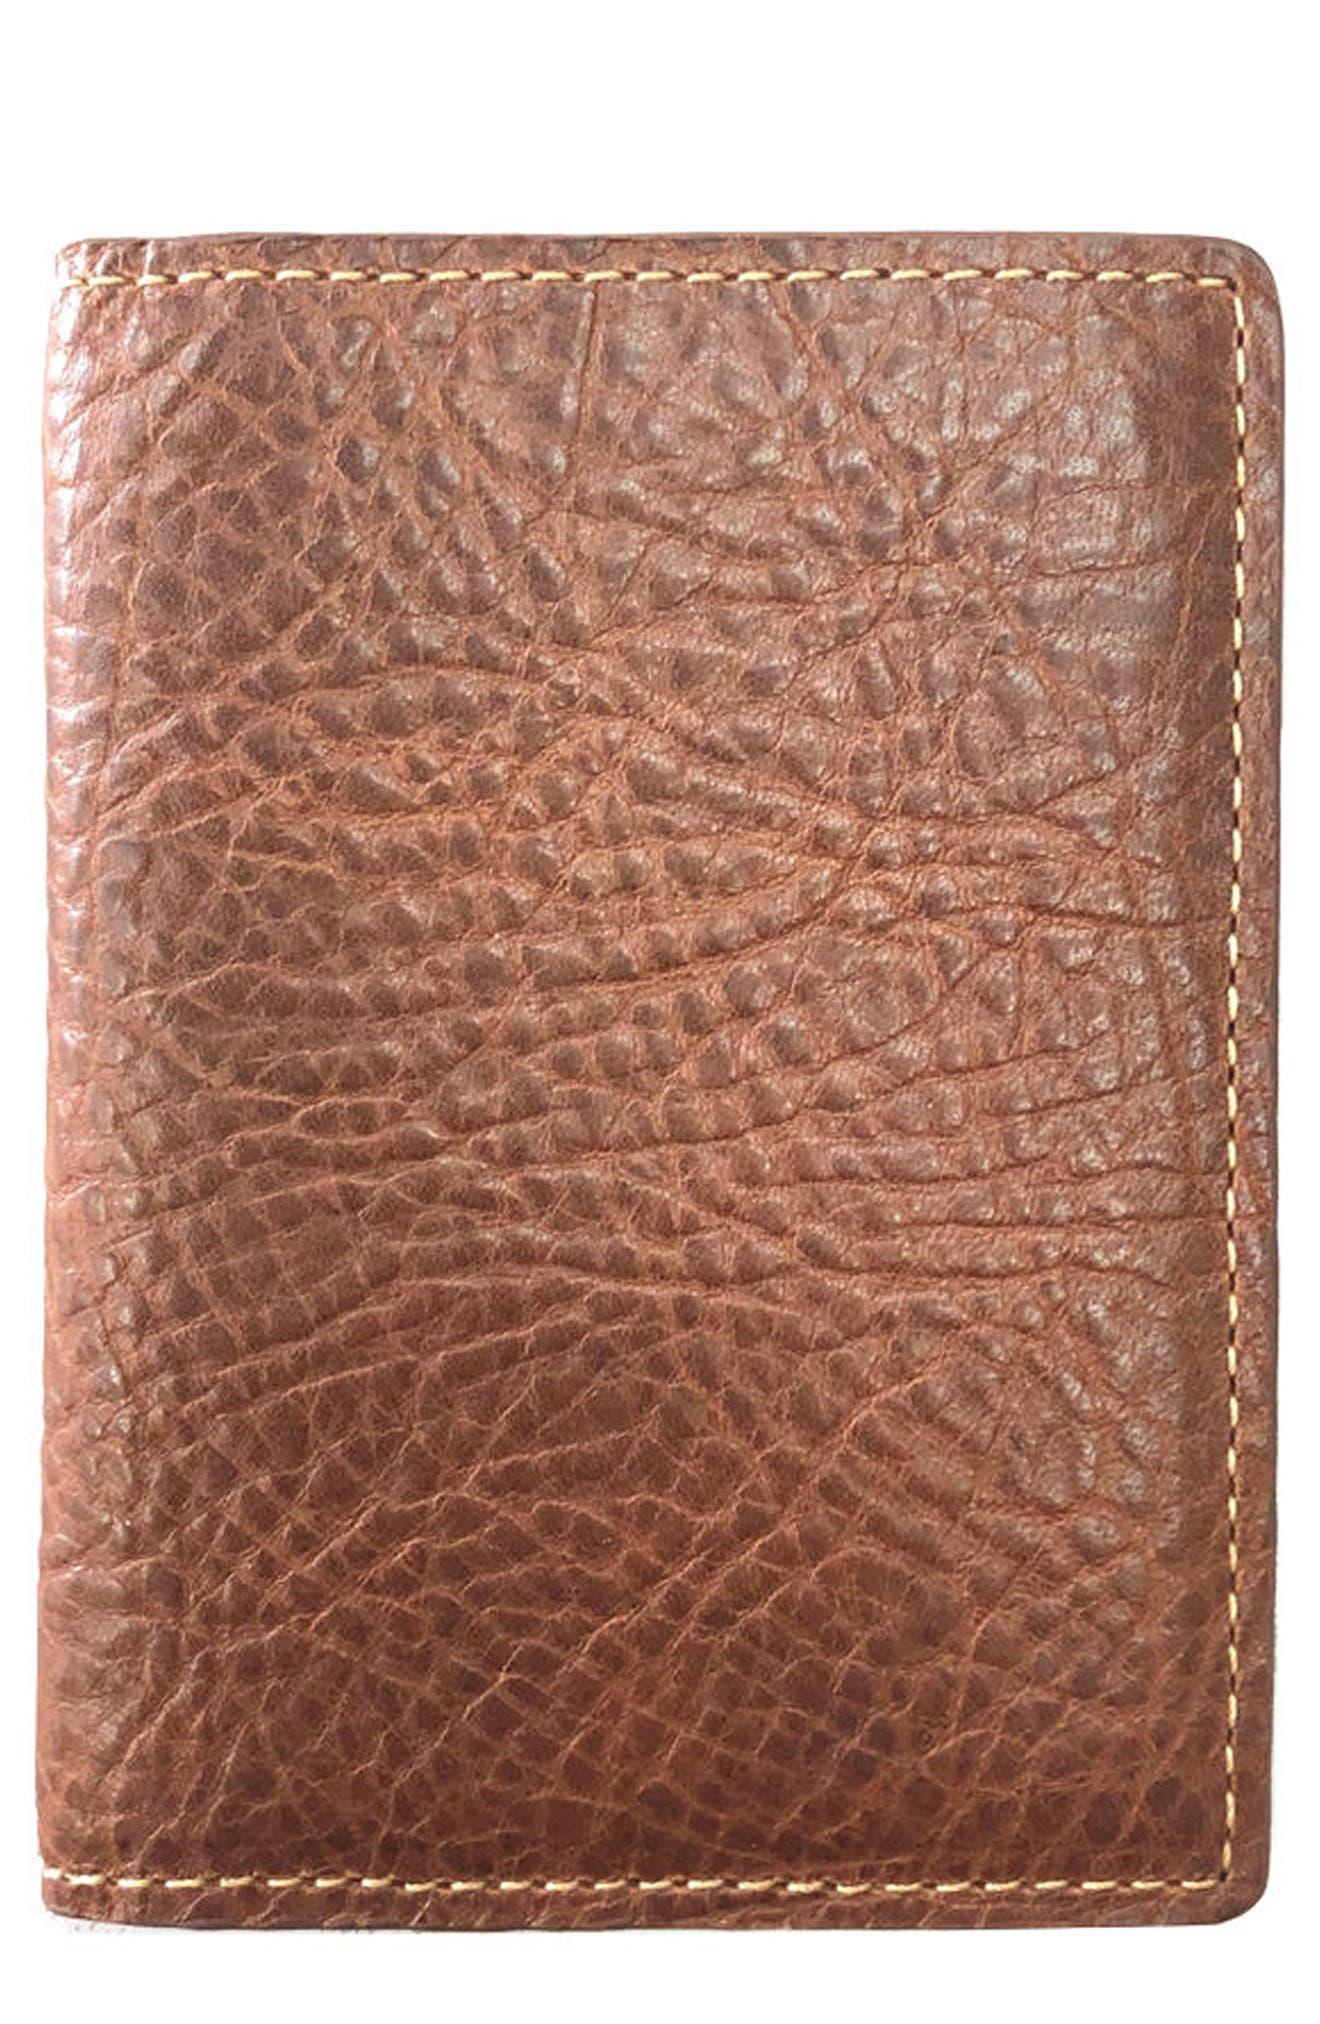 Caleb Leather Folding Card Case,                             Main thumbnail 1, color,                             Chestnut